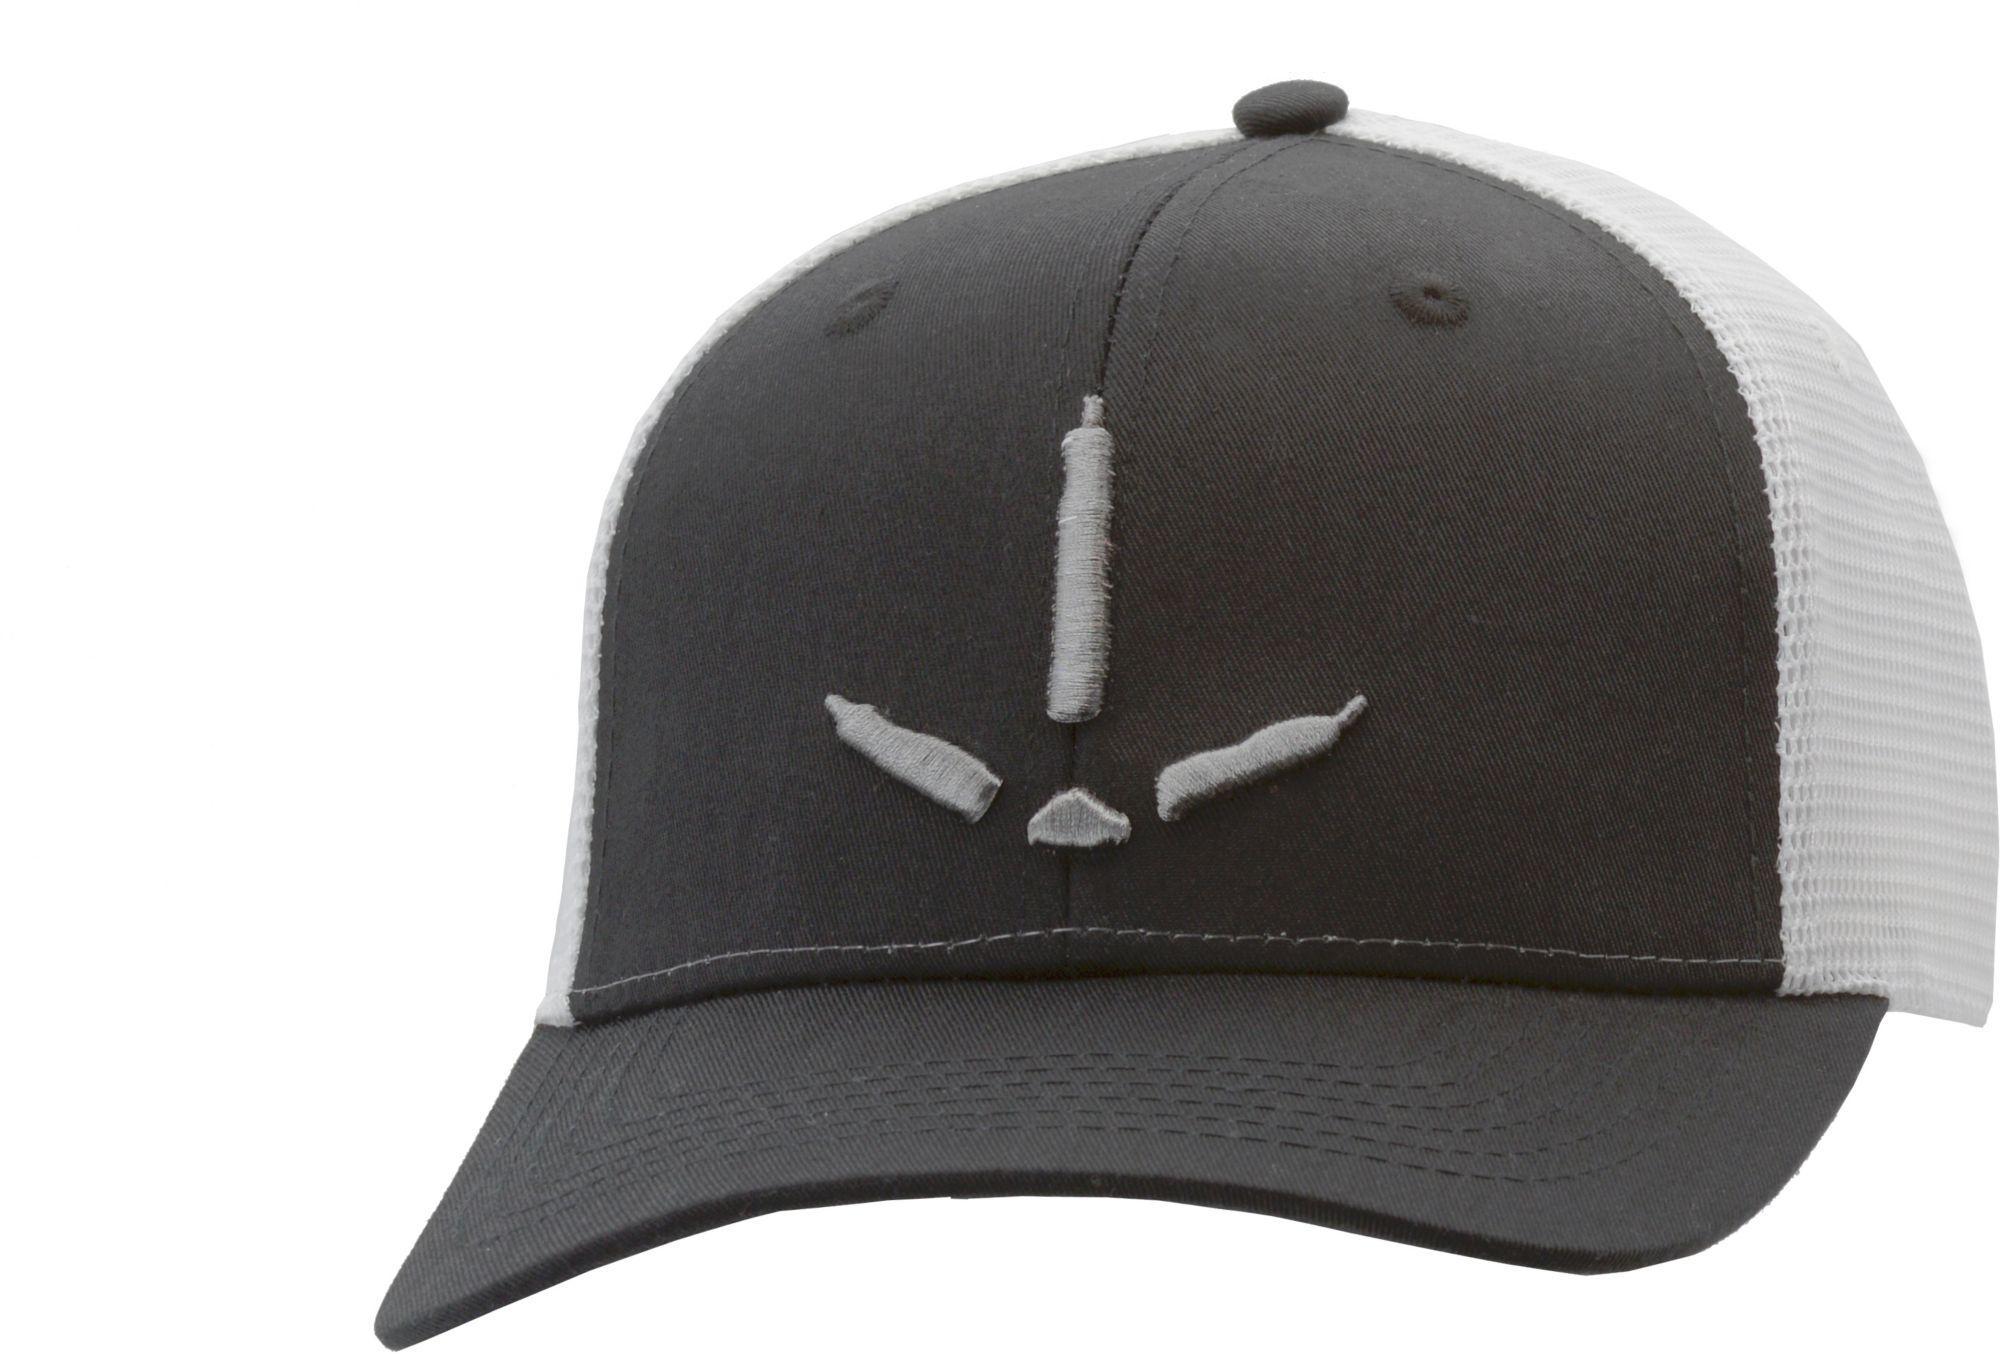 df77d1027850 Nomad - Gray Turkey Track Trucker Hat for Men - Lyst. View fullscreen